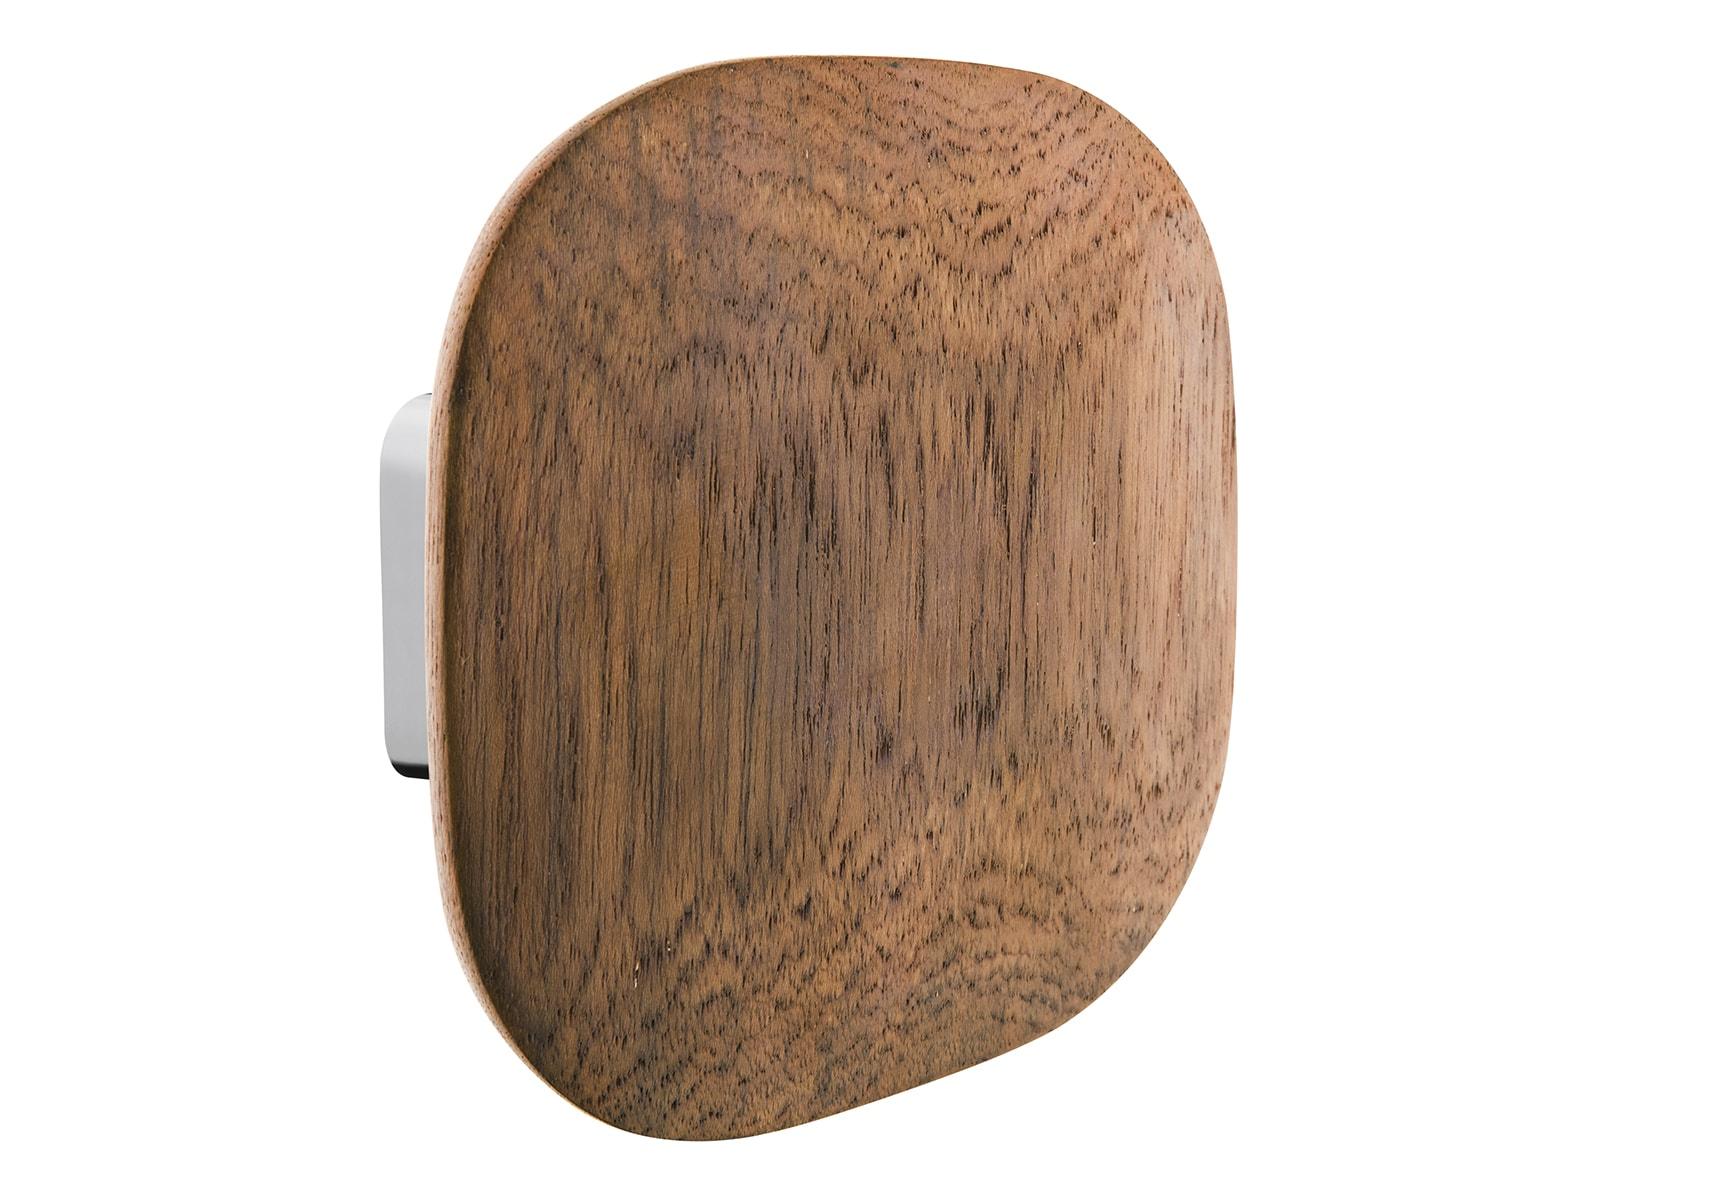 Eternity Large Bathrobe Holder (Square – Wooden)